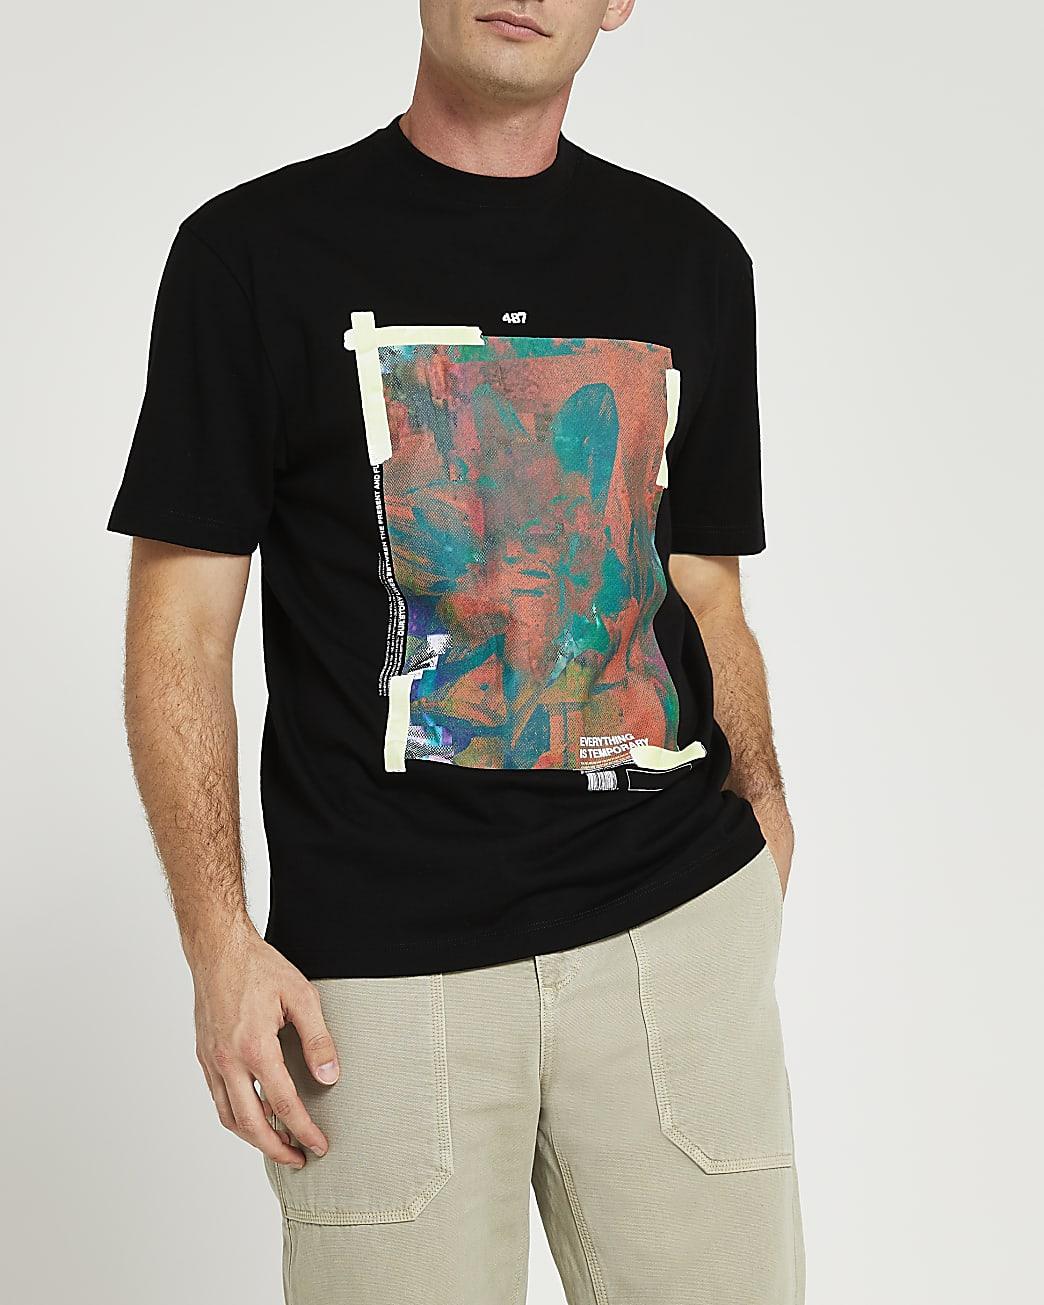 Black regular fit graphic t-shirt